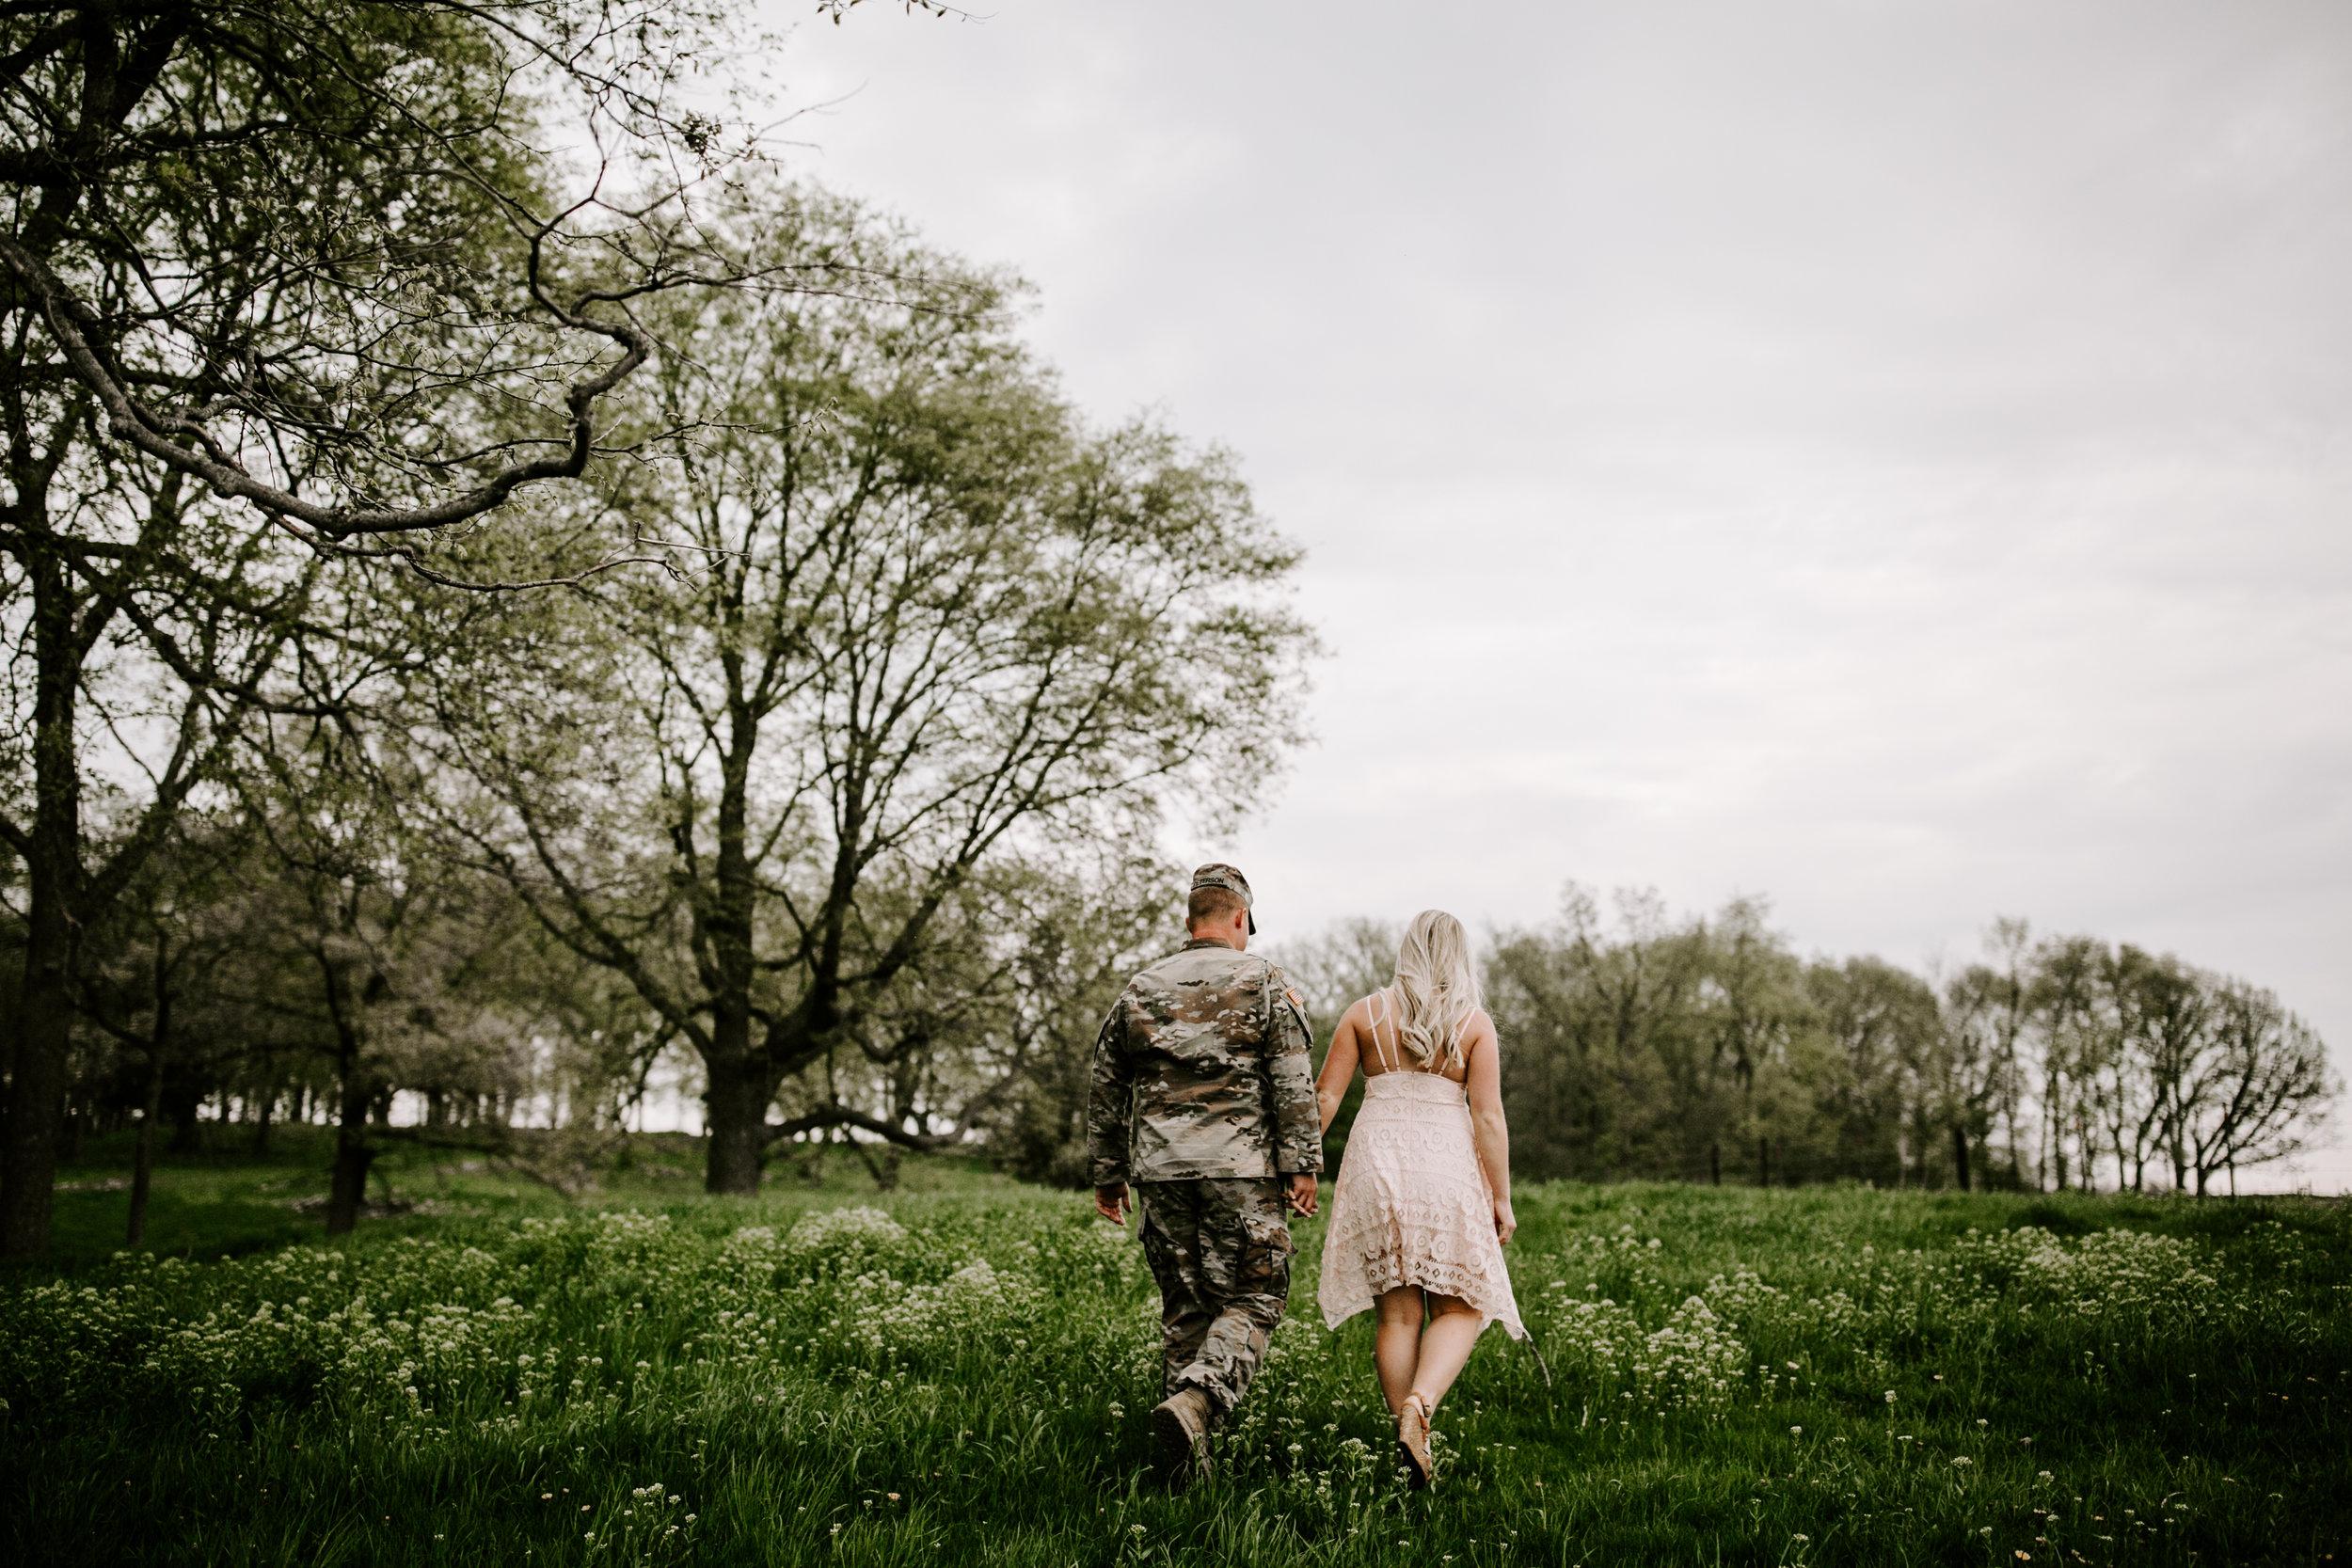 gracetphotography-wedding-photographer-adventure-bride-engagement-24.jpg